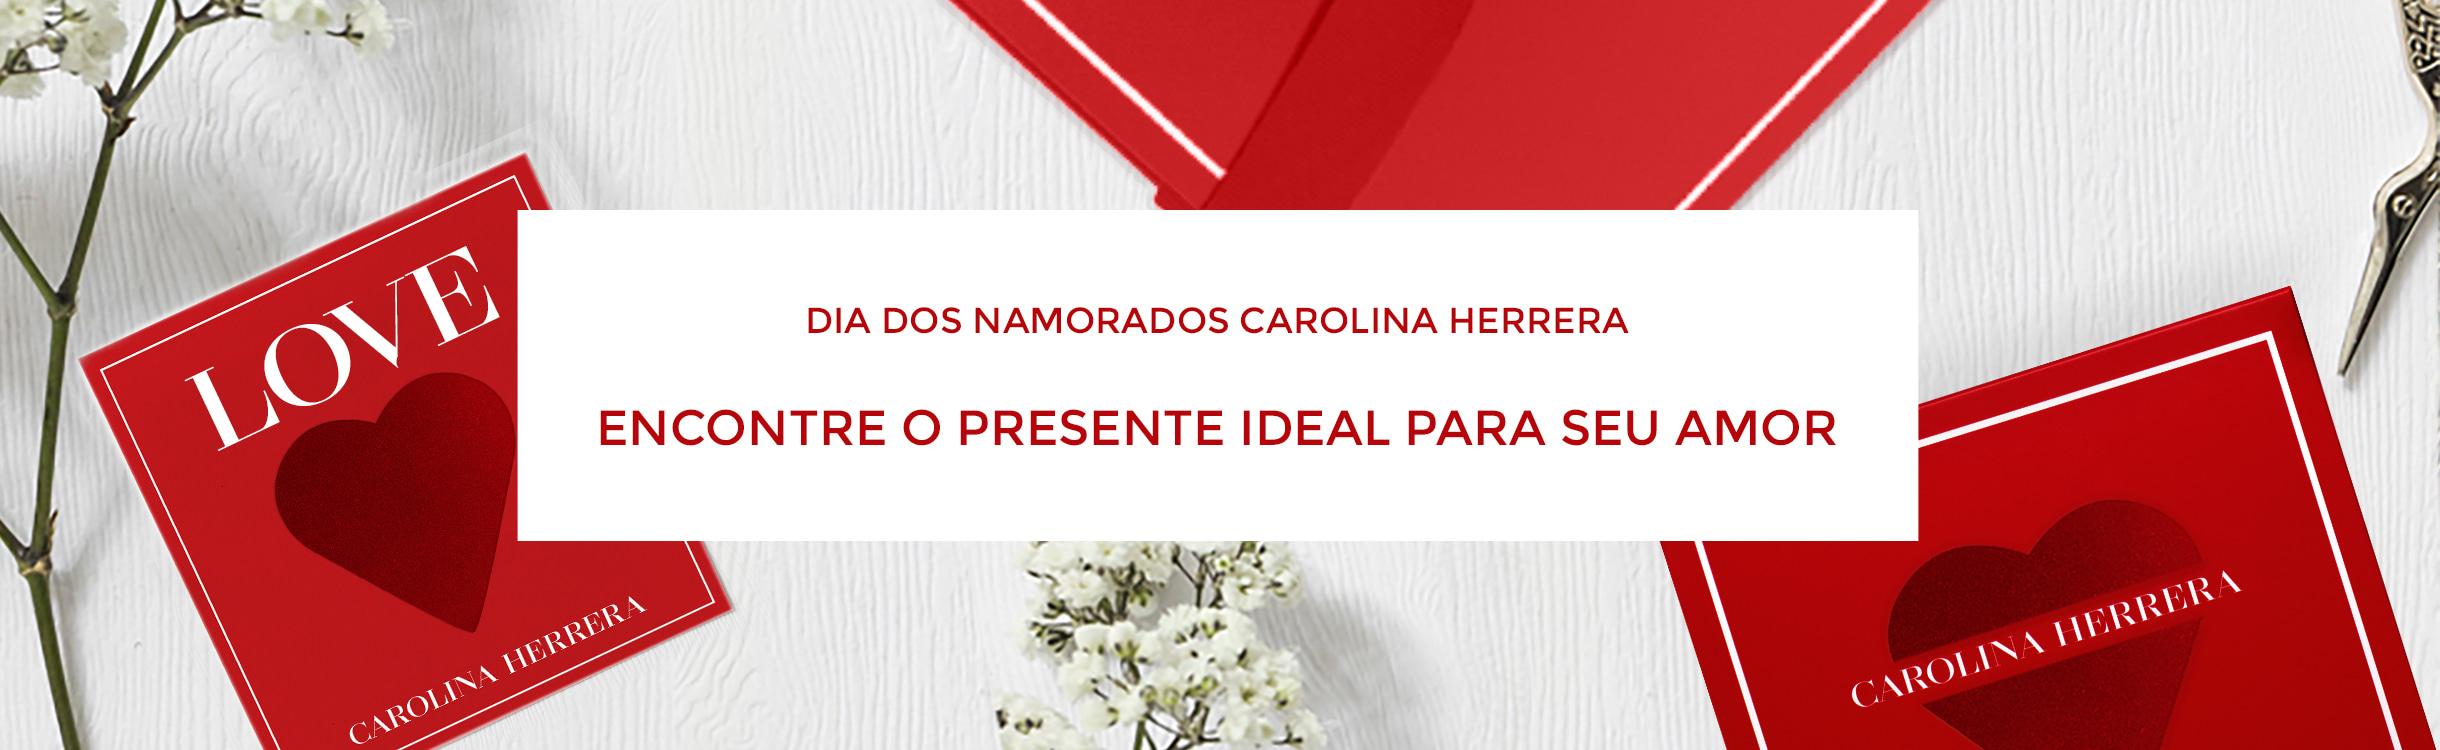 Carolina Herrera | O Casal Poderoso